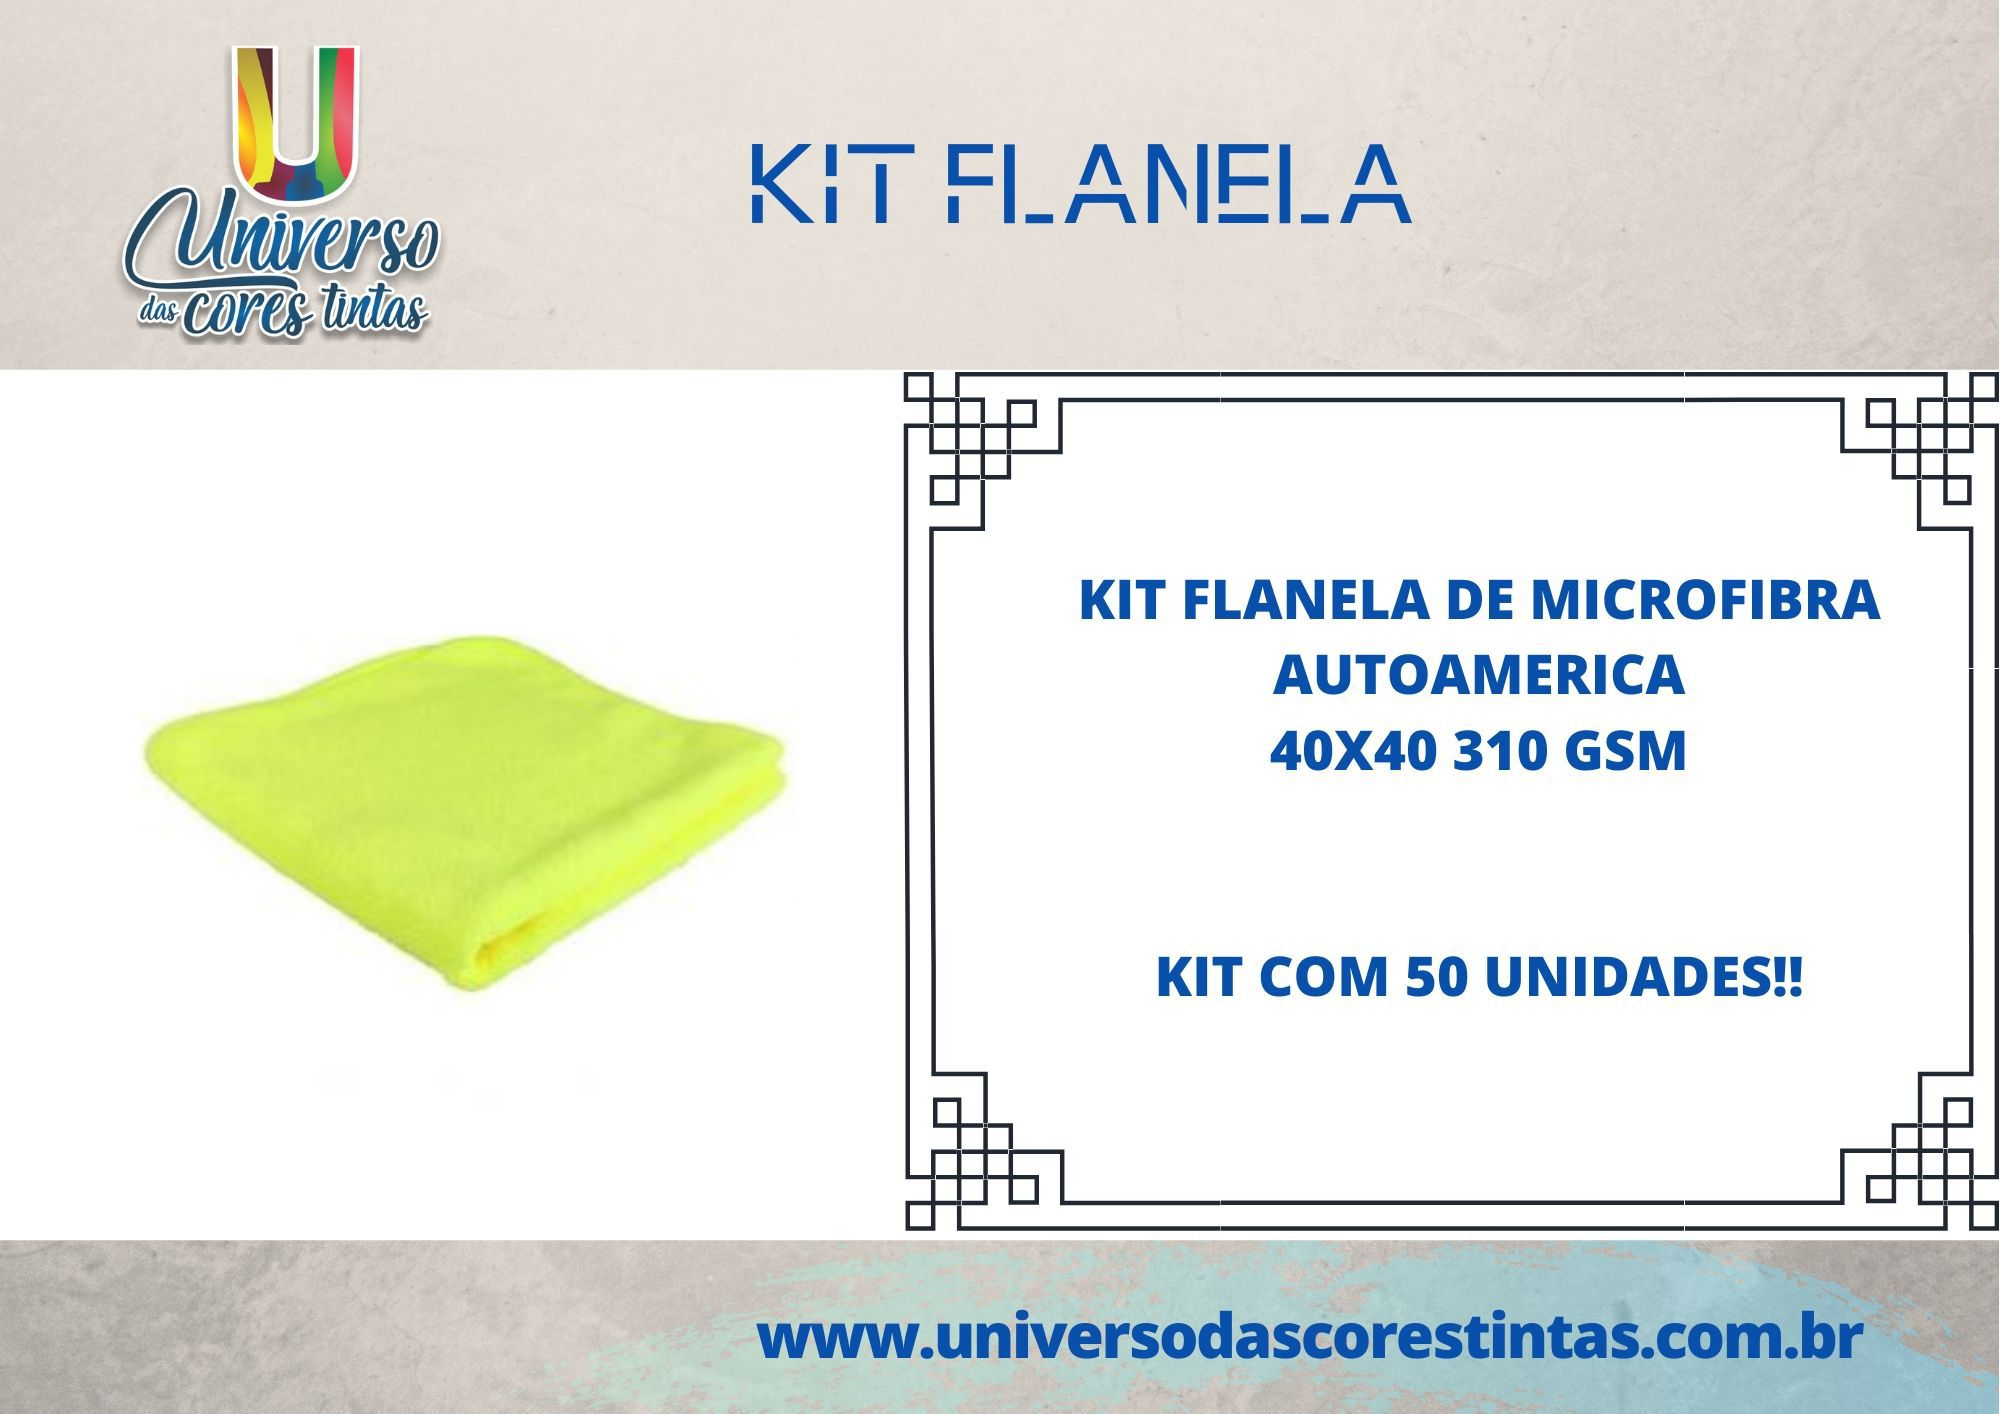 Kit de Flanela de Microfibra 40x40 310 GSM Autoamerica (50 Unidades)